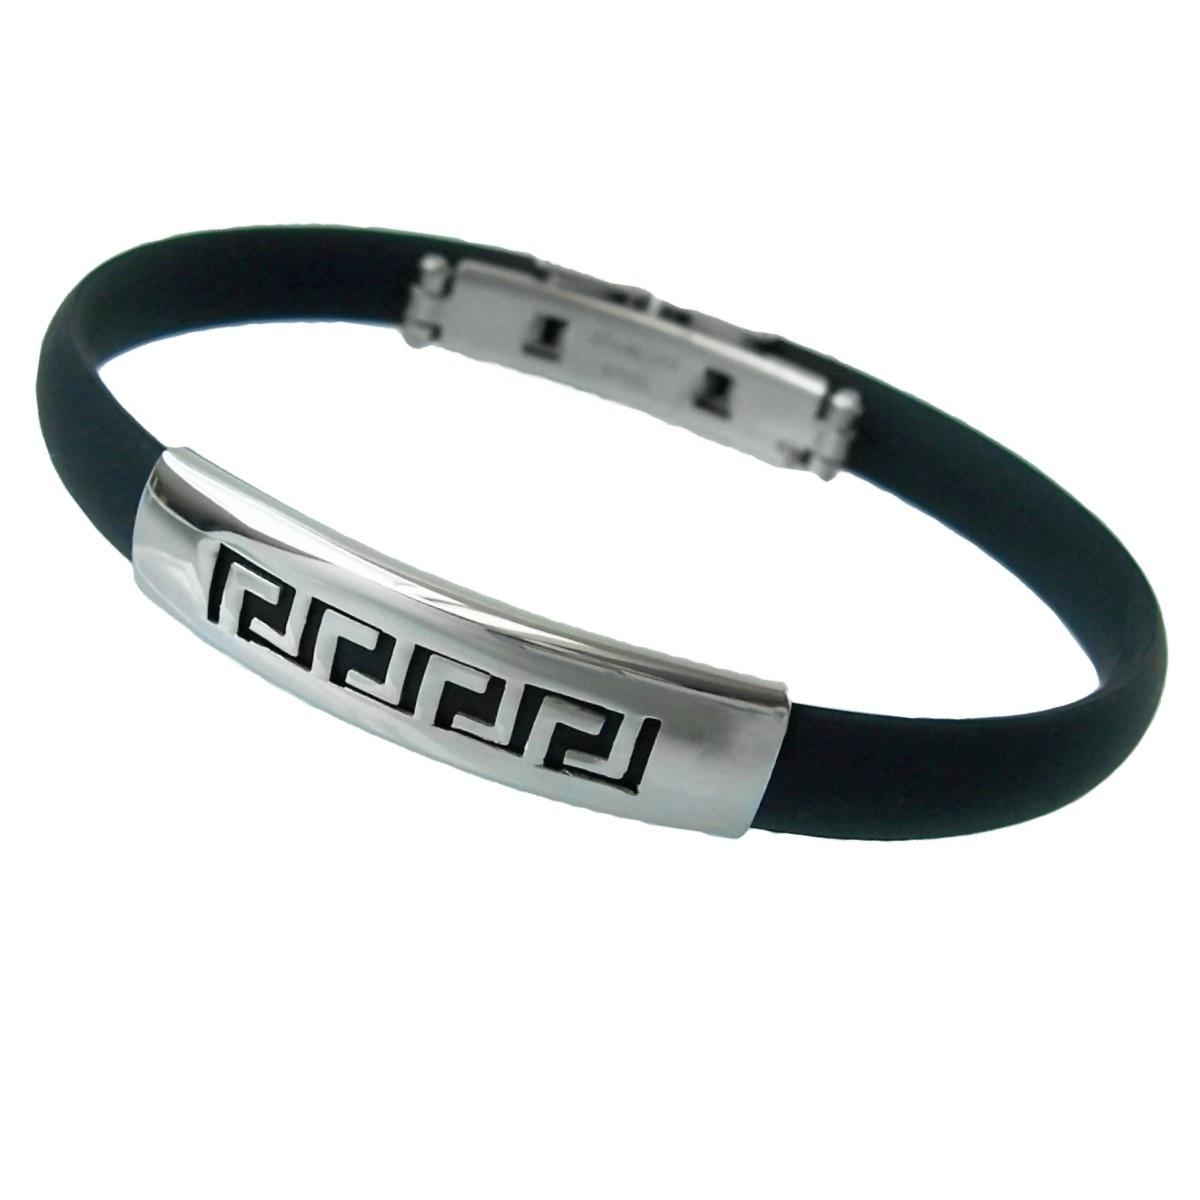 Surferarmband Edelstahl Armband Herrenarmband schwarz Mäander A14